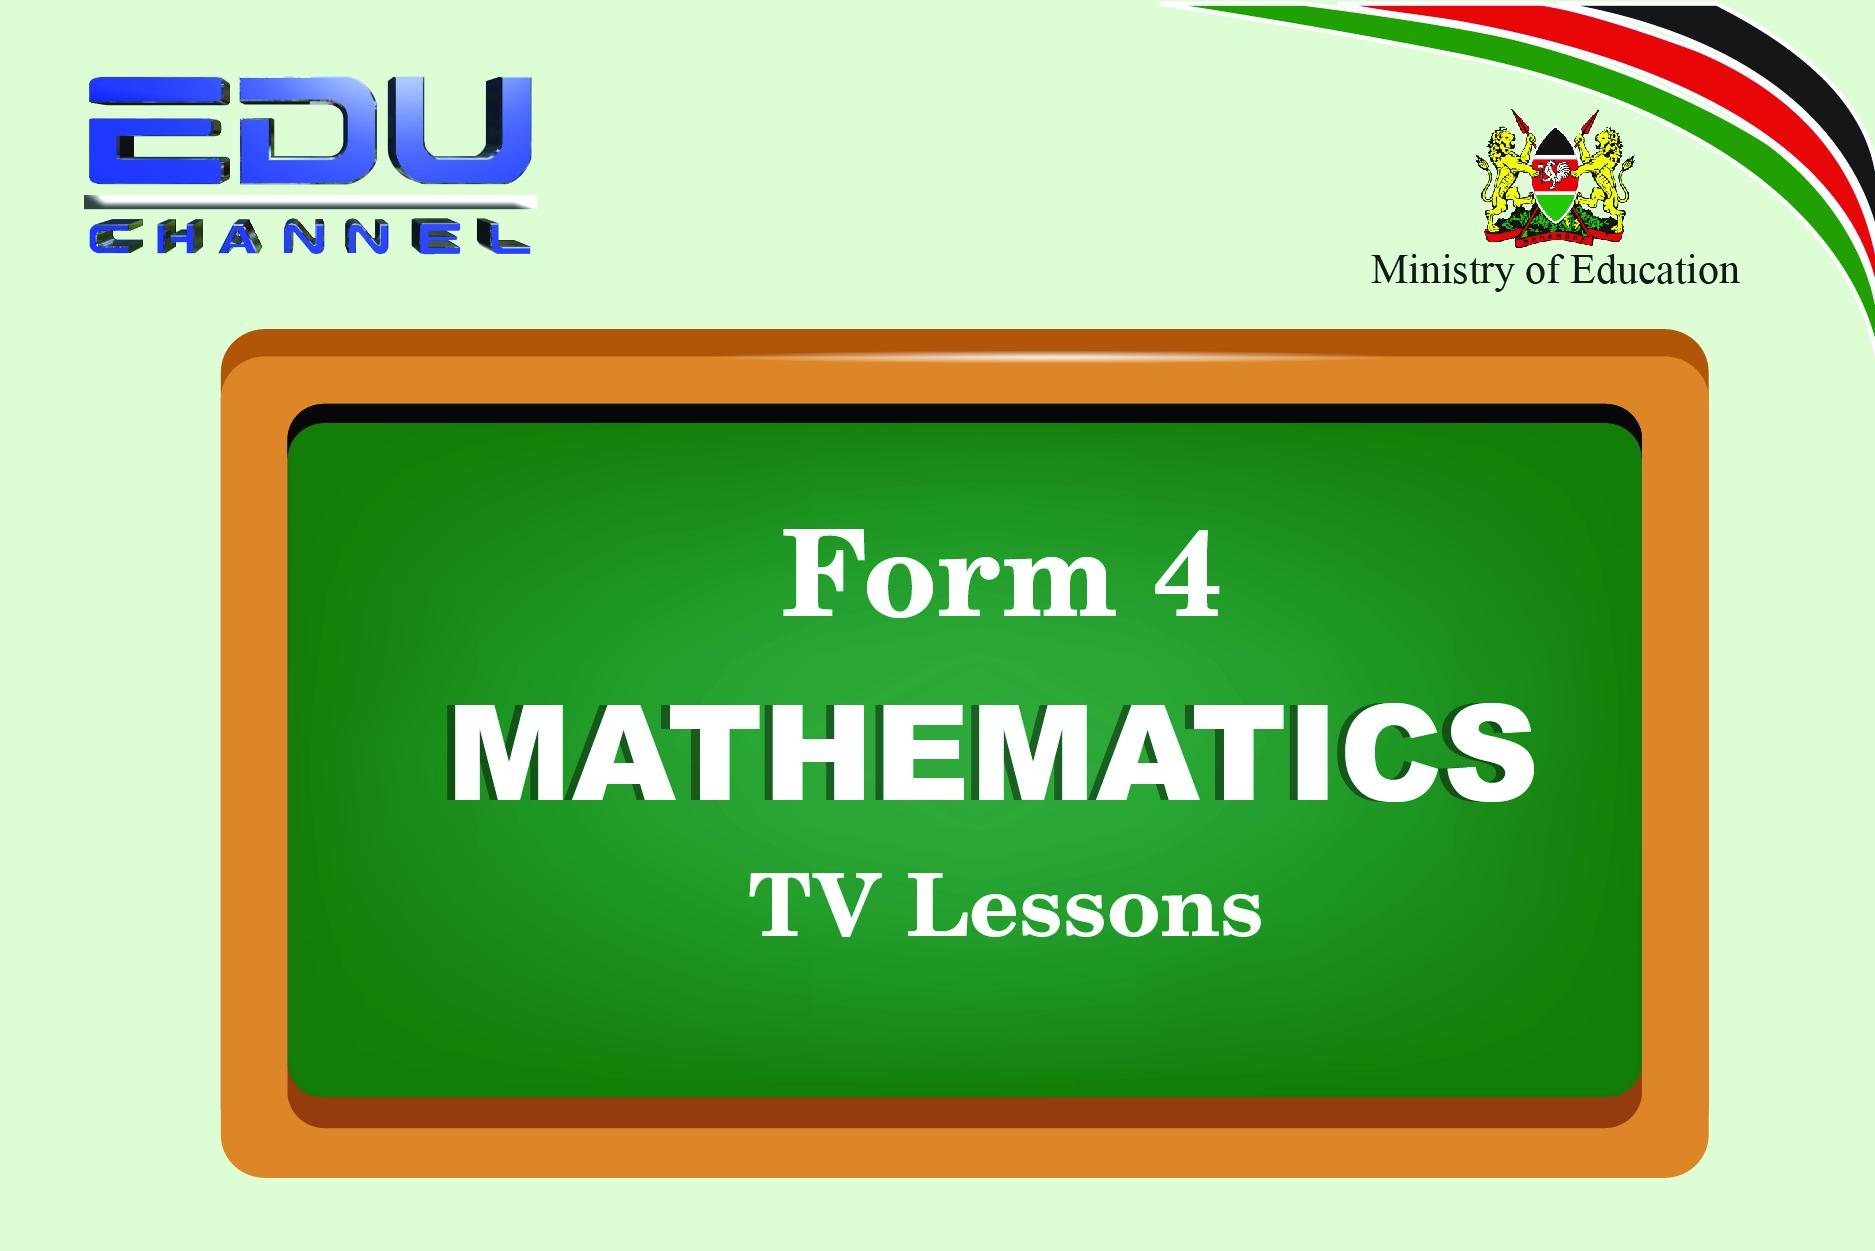 Form 4 Mathematics Lesson 12: Differentiation-Gradient of a curve point